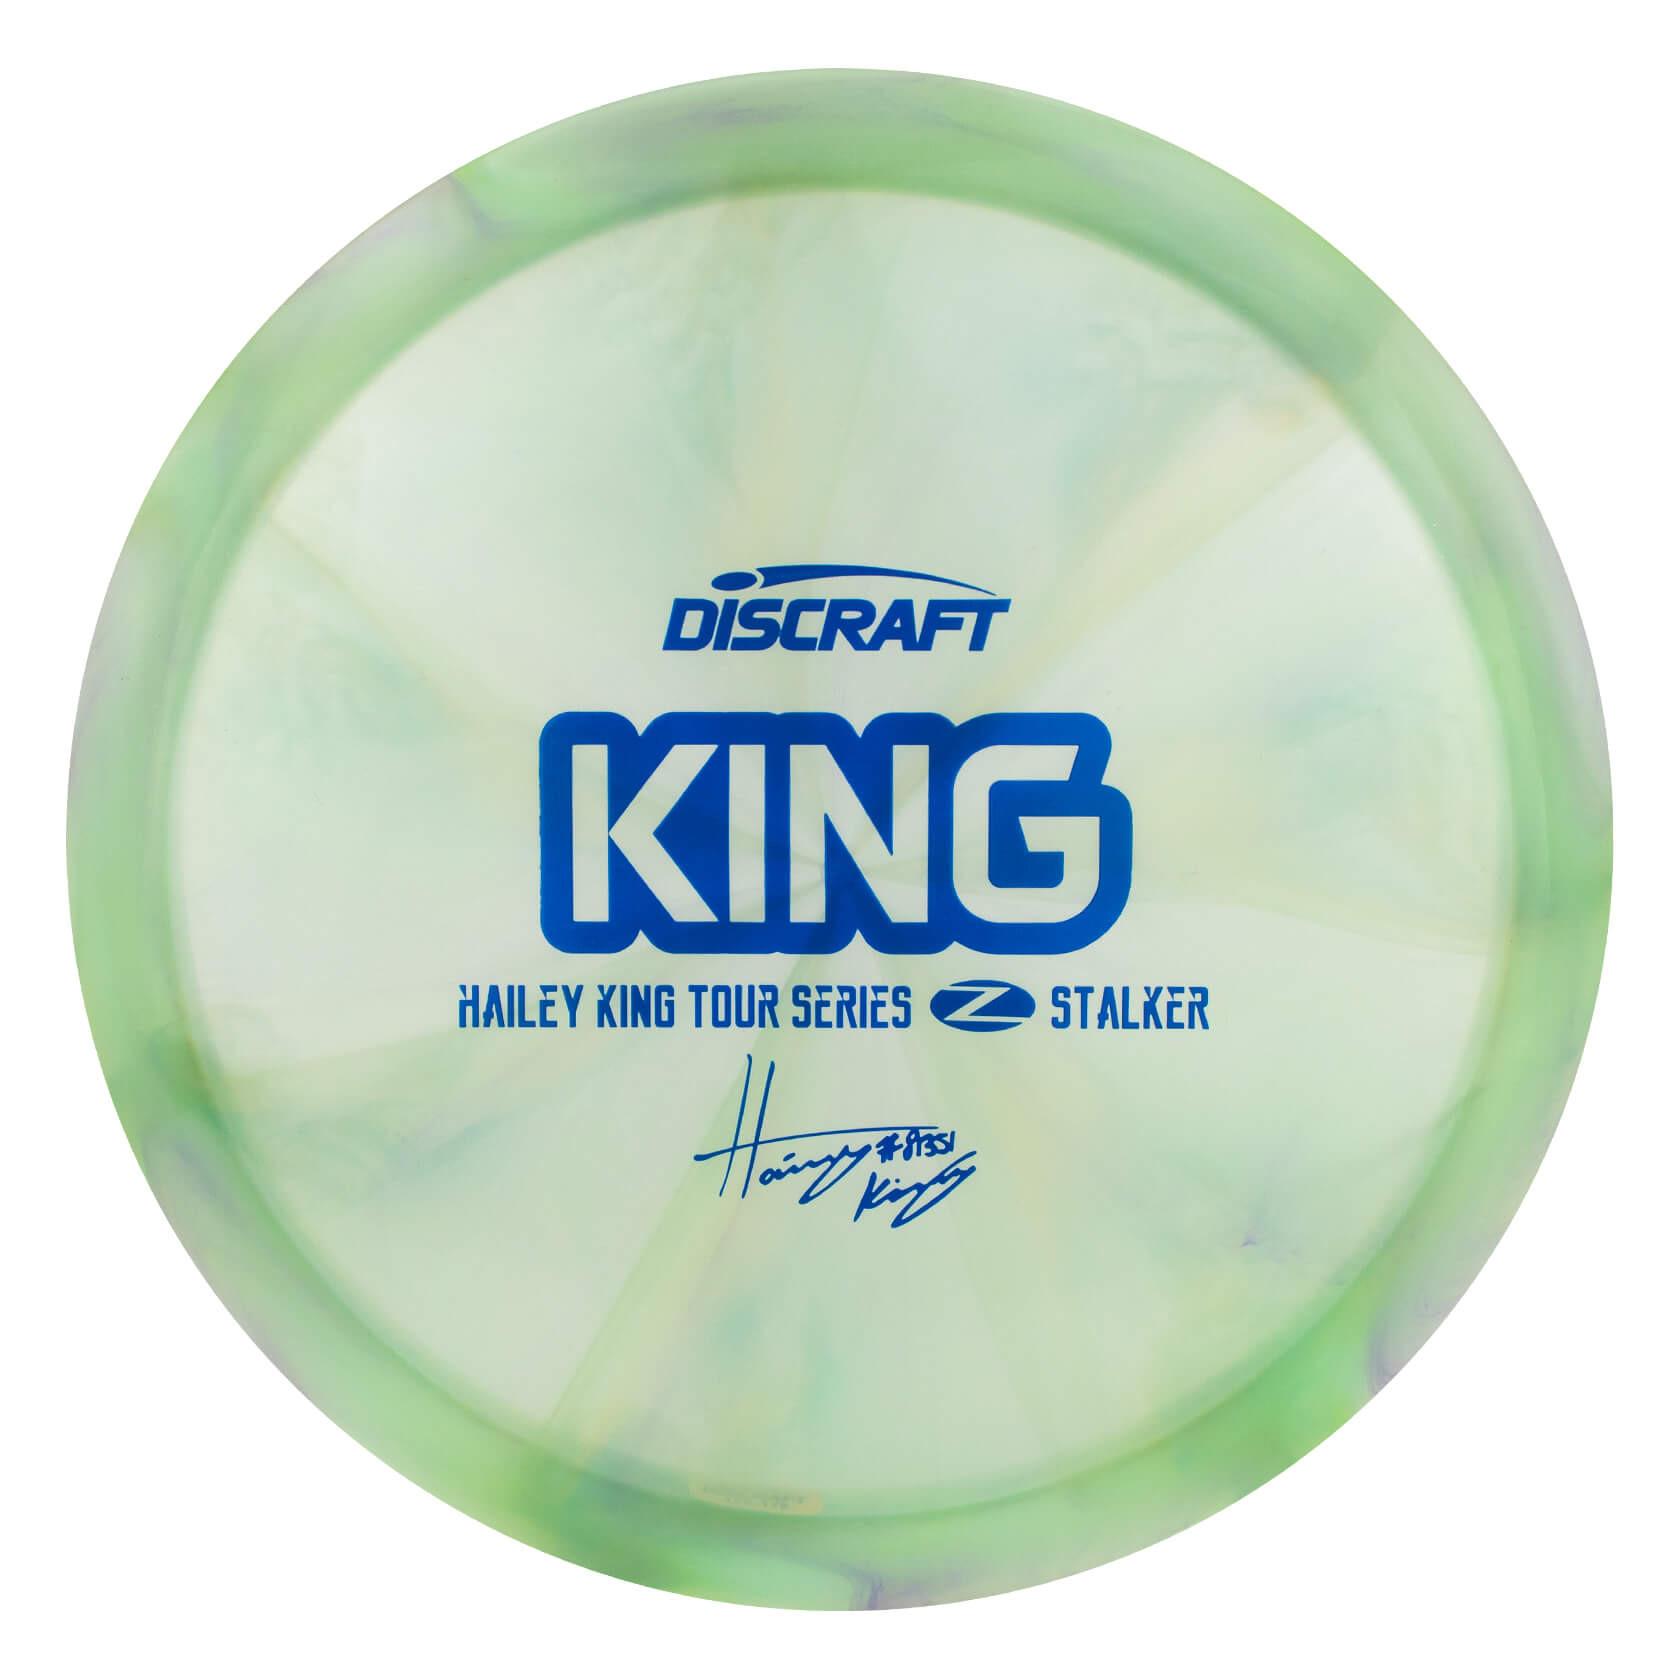 Discraft Swirly Z Stalker Hailey King Tour Series